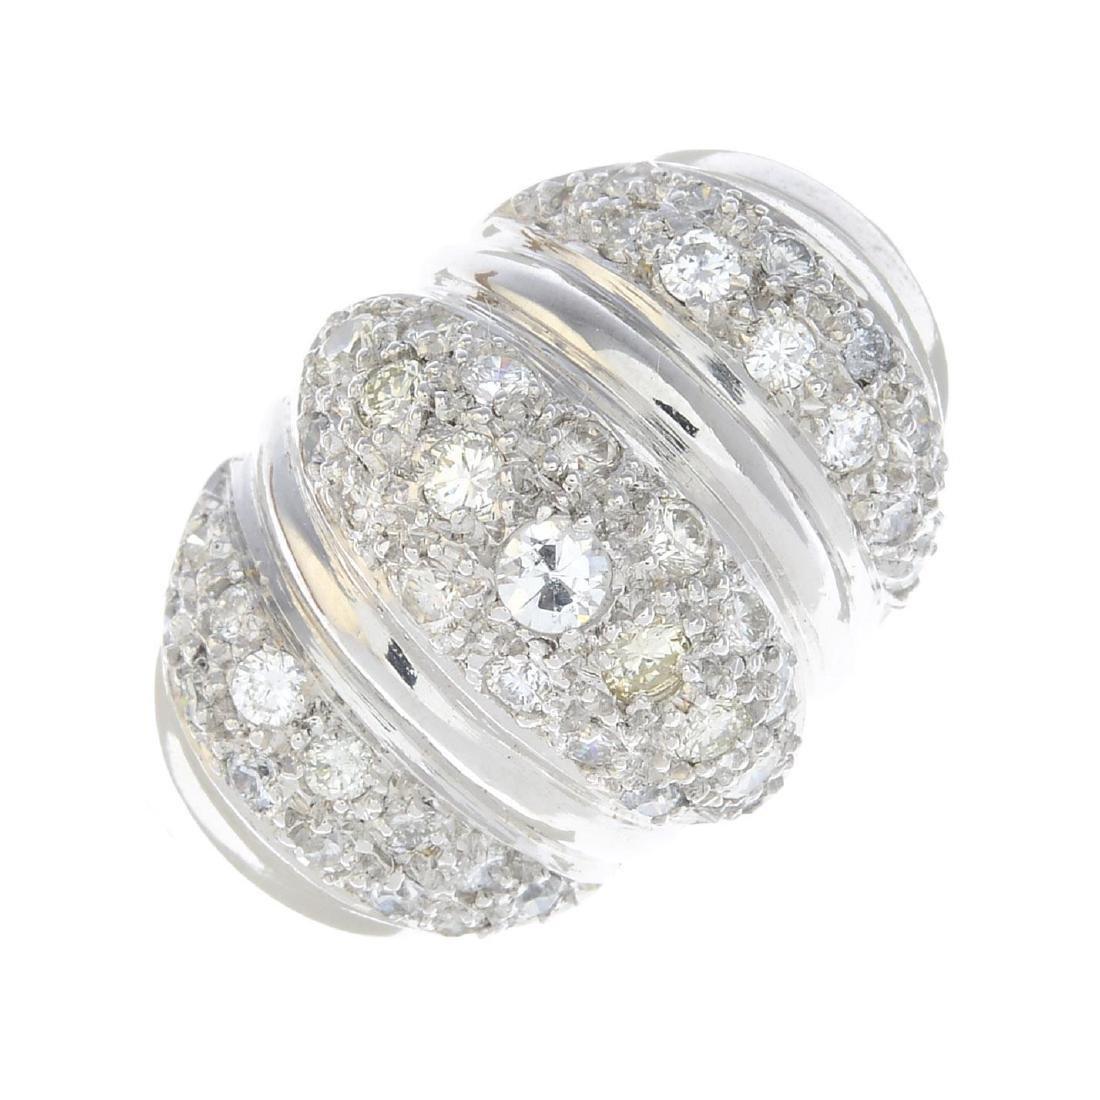 A diamond dress ring. The pave-set diamond